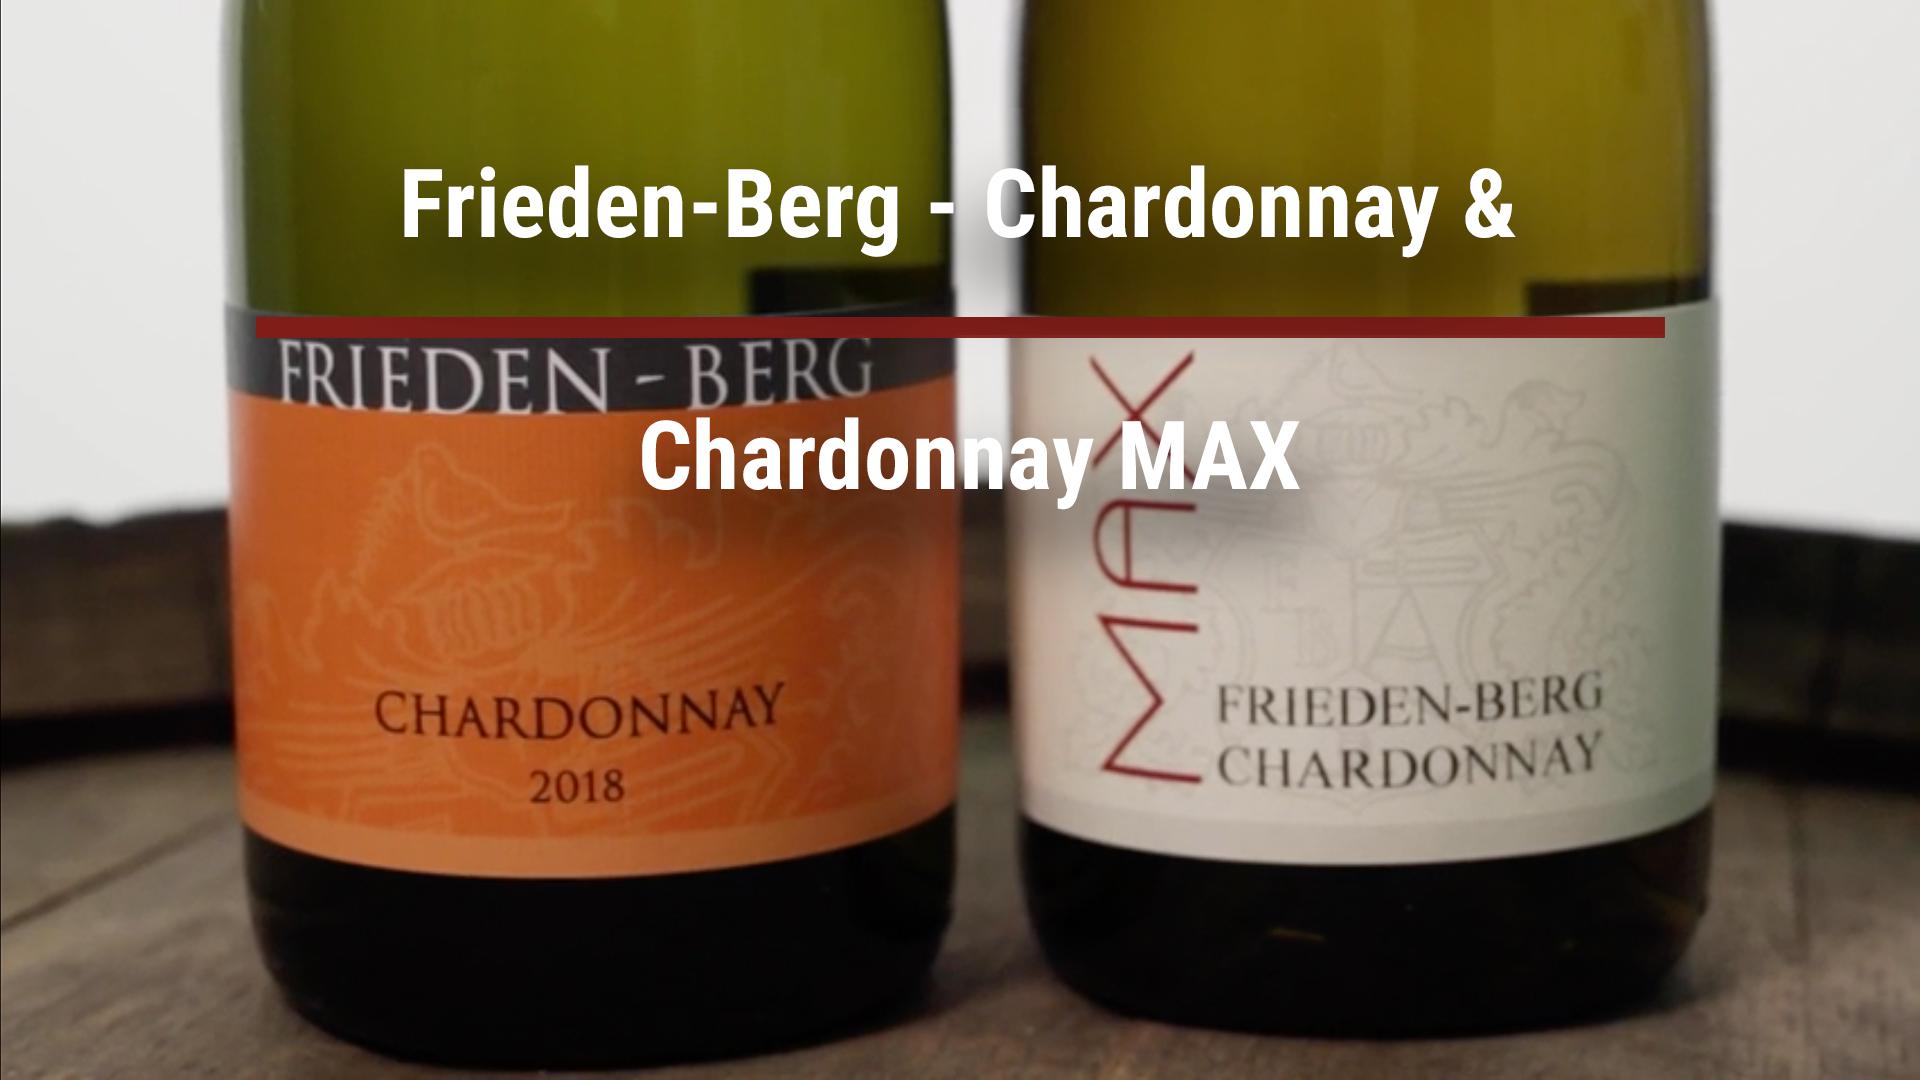 Frieden-Berg – Chardonnay & Chardonnay MAX